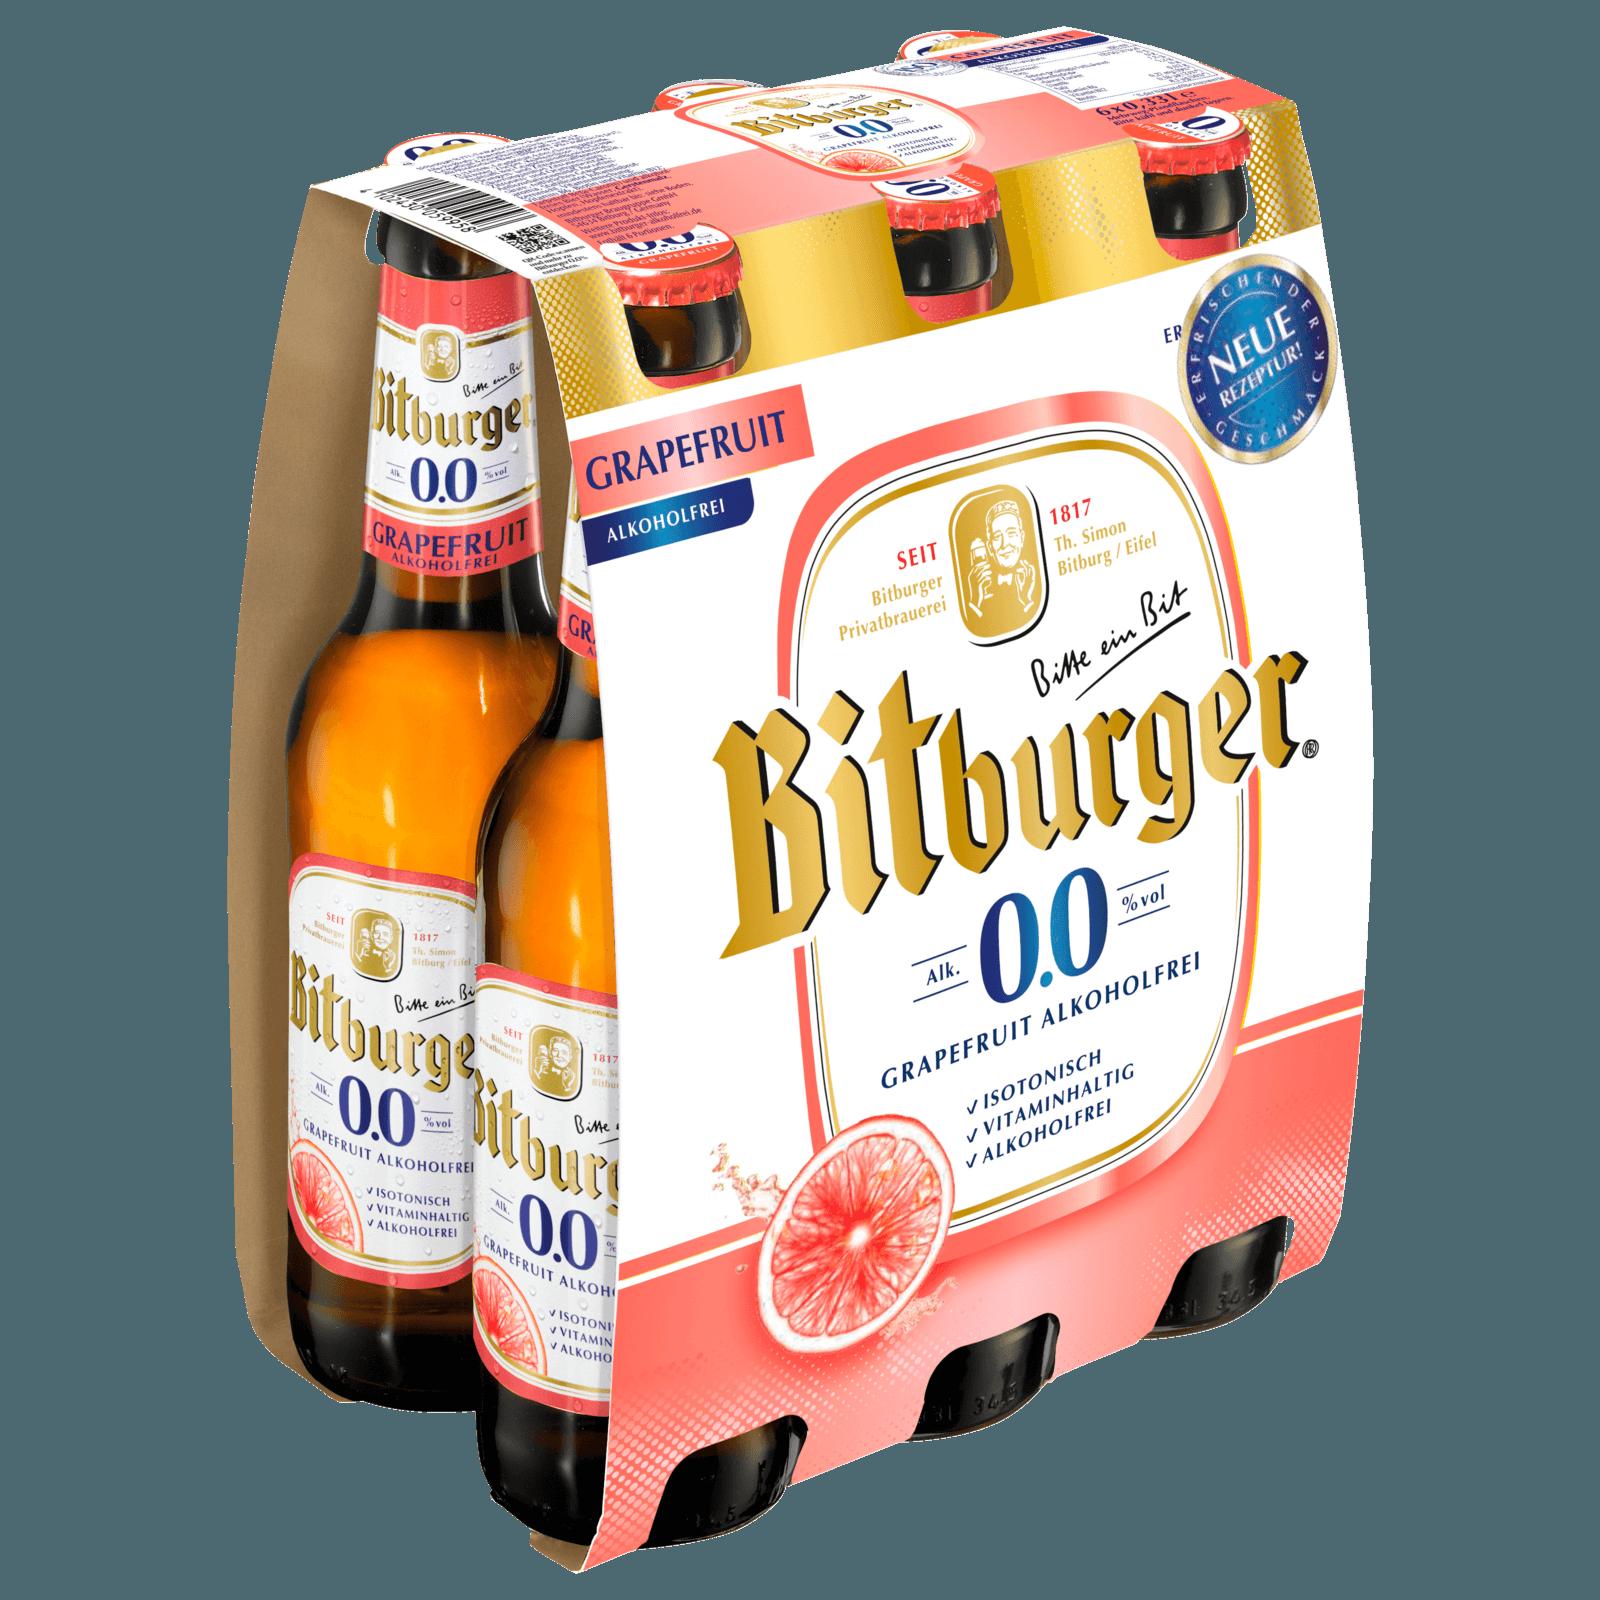 Bitburger 0,0% Grapefruit Alkoholfrei 6x0,33l